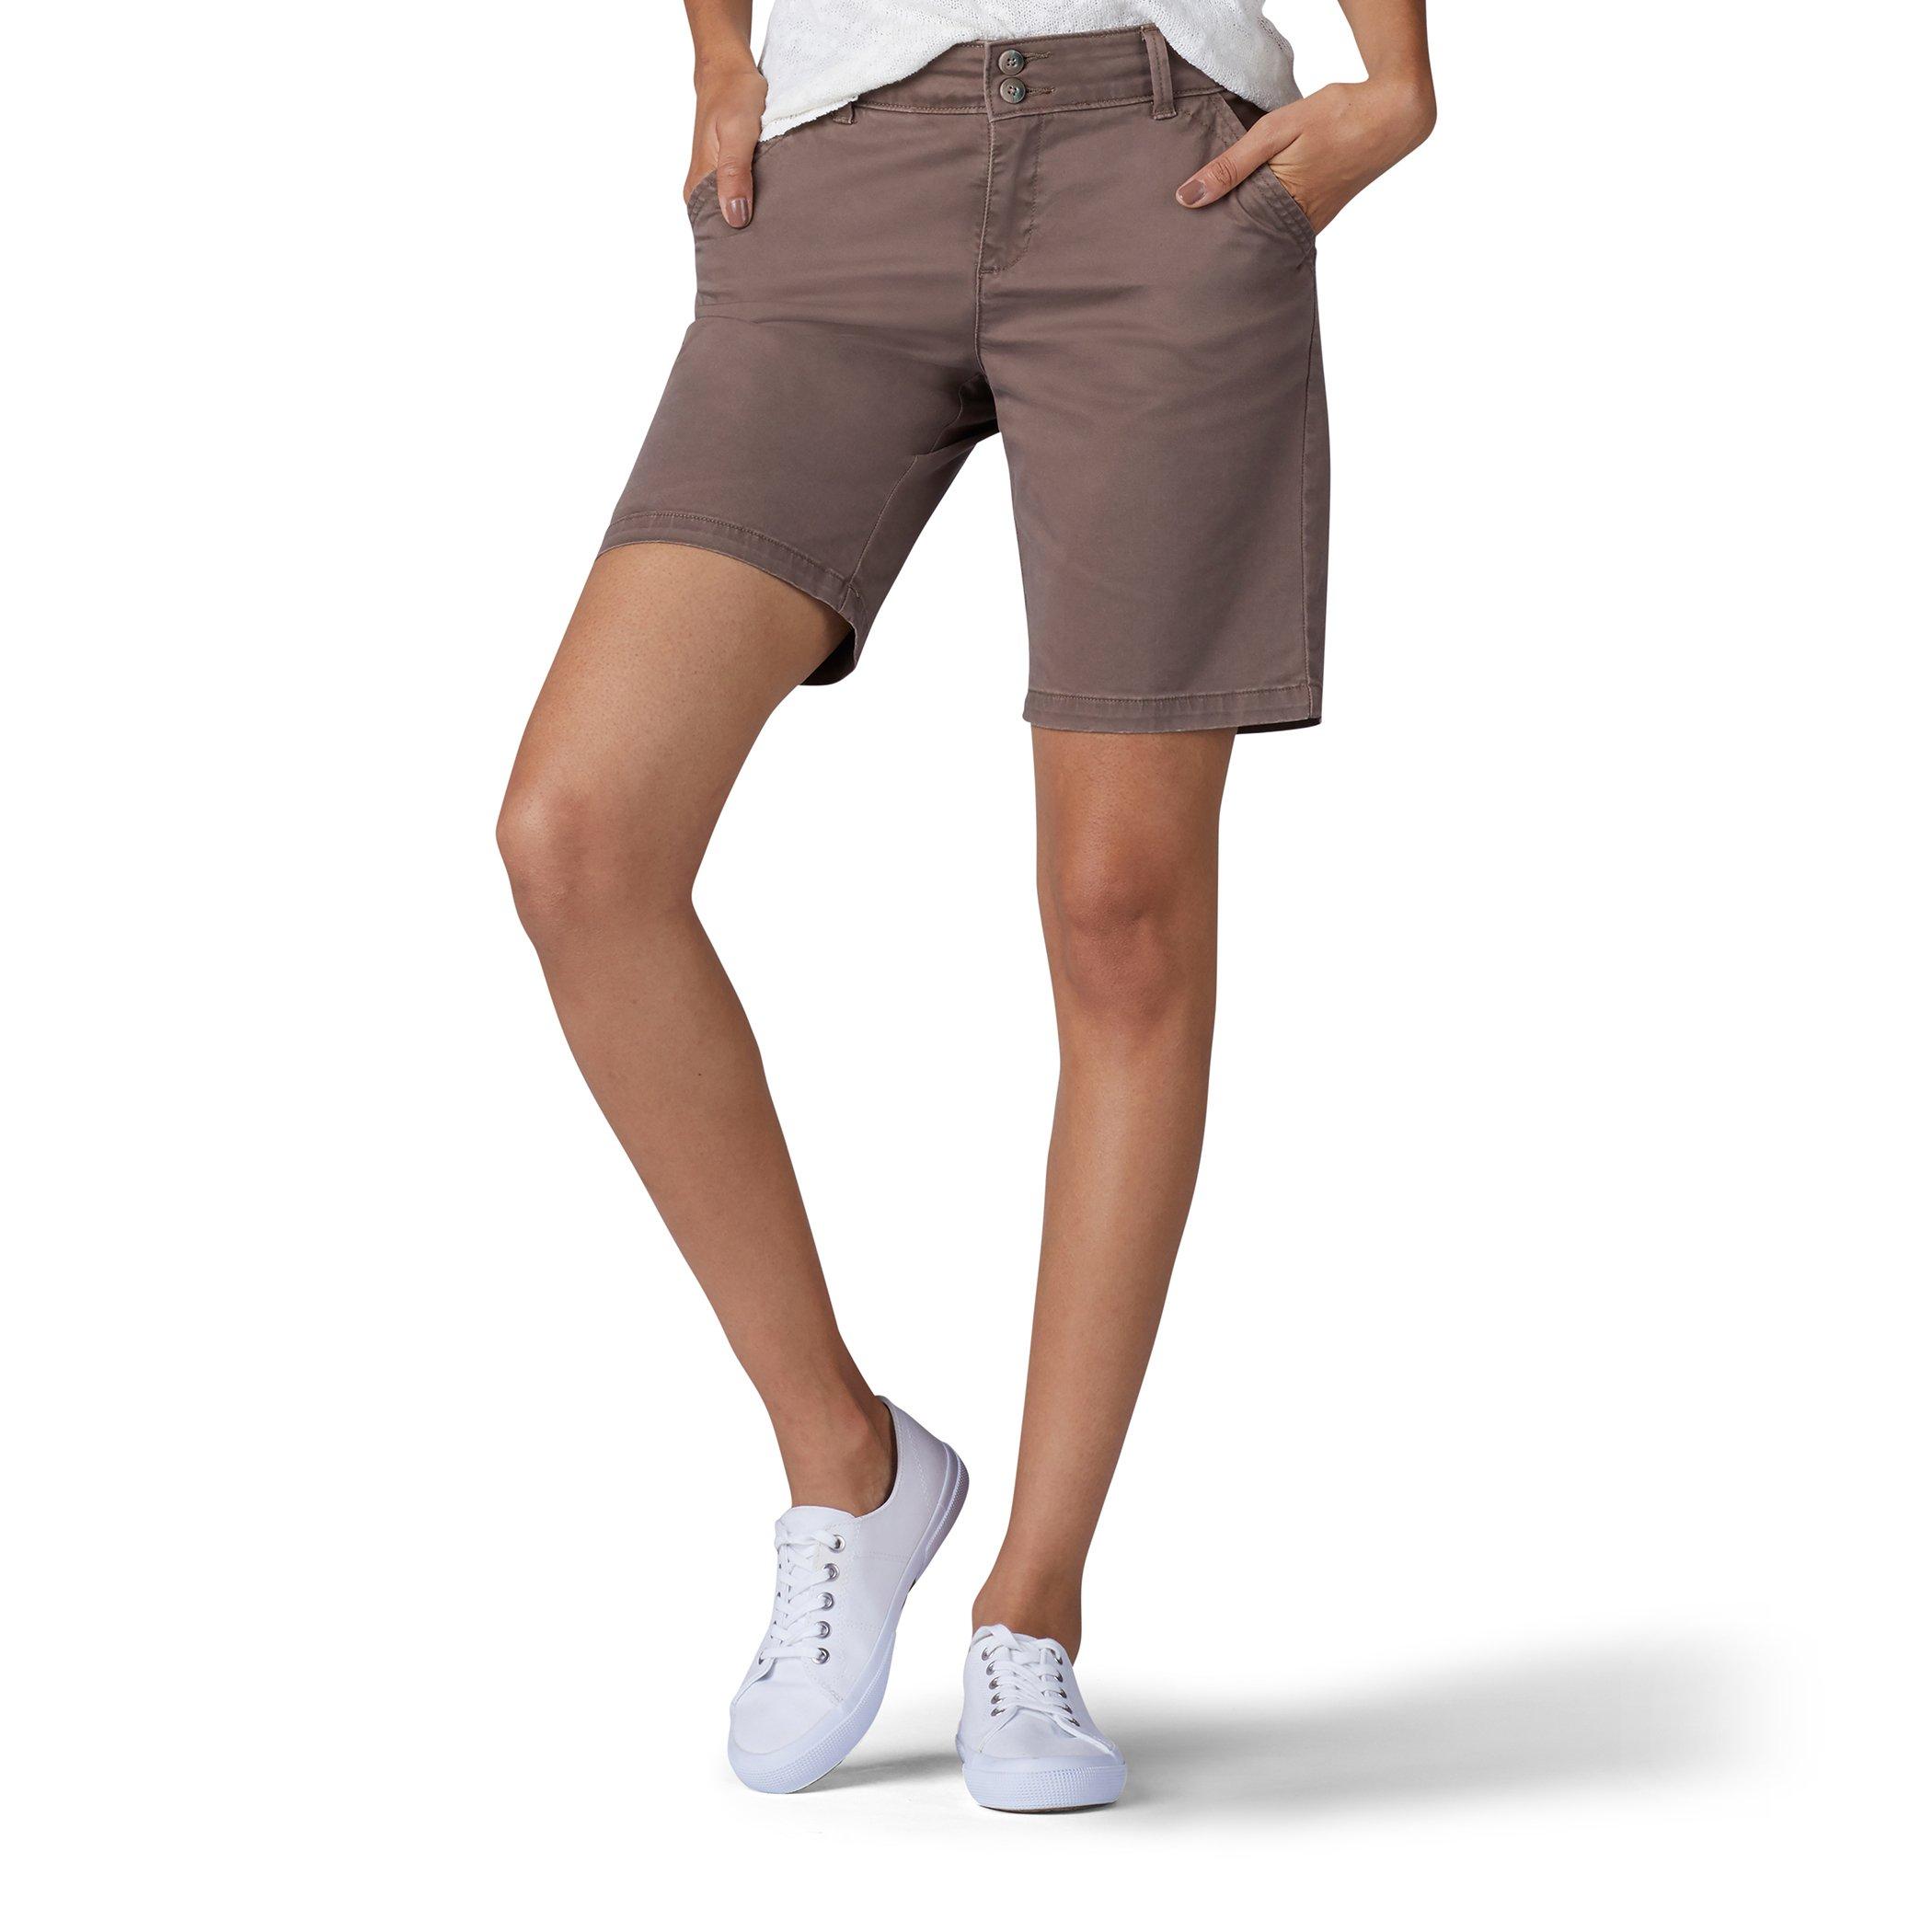 LEE Women's Straight Fit Tailored Chino Bermuda Short, Vintage deep Breen, 10